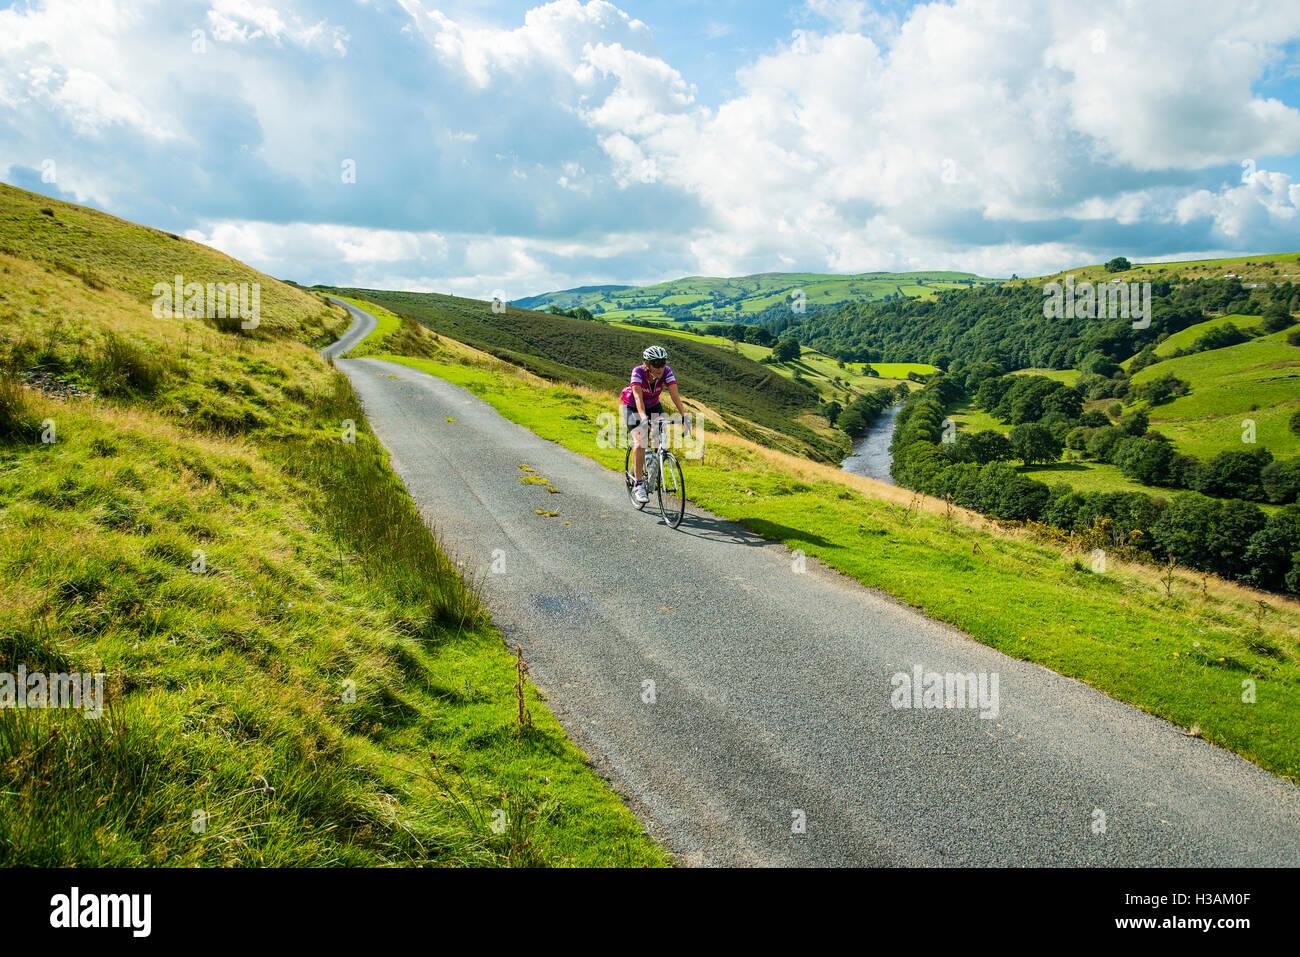 Ciclista femenina en Fairmile Lane en la Lune Gorge Cumbria Inglaterra Imagen De Stock